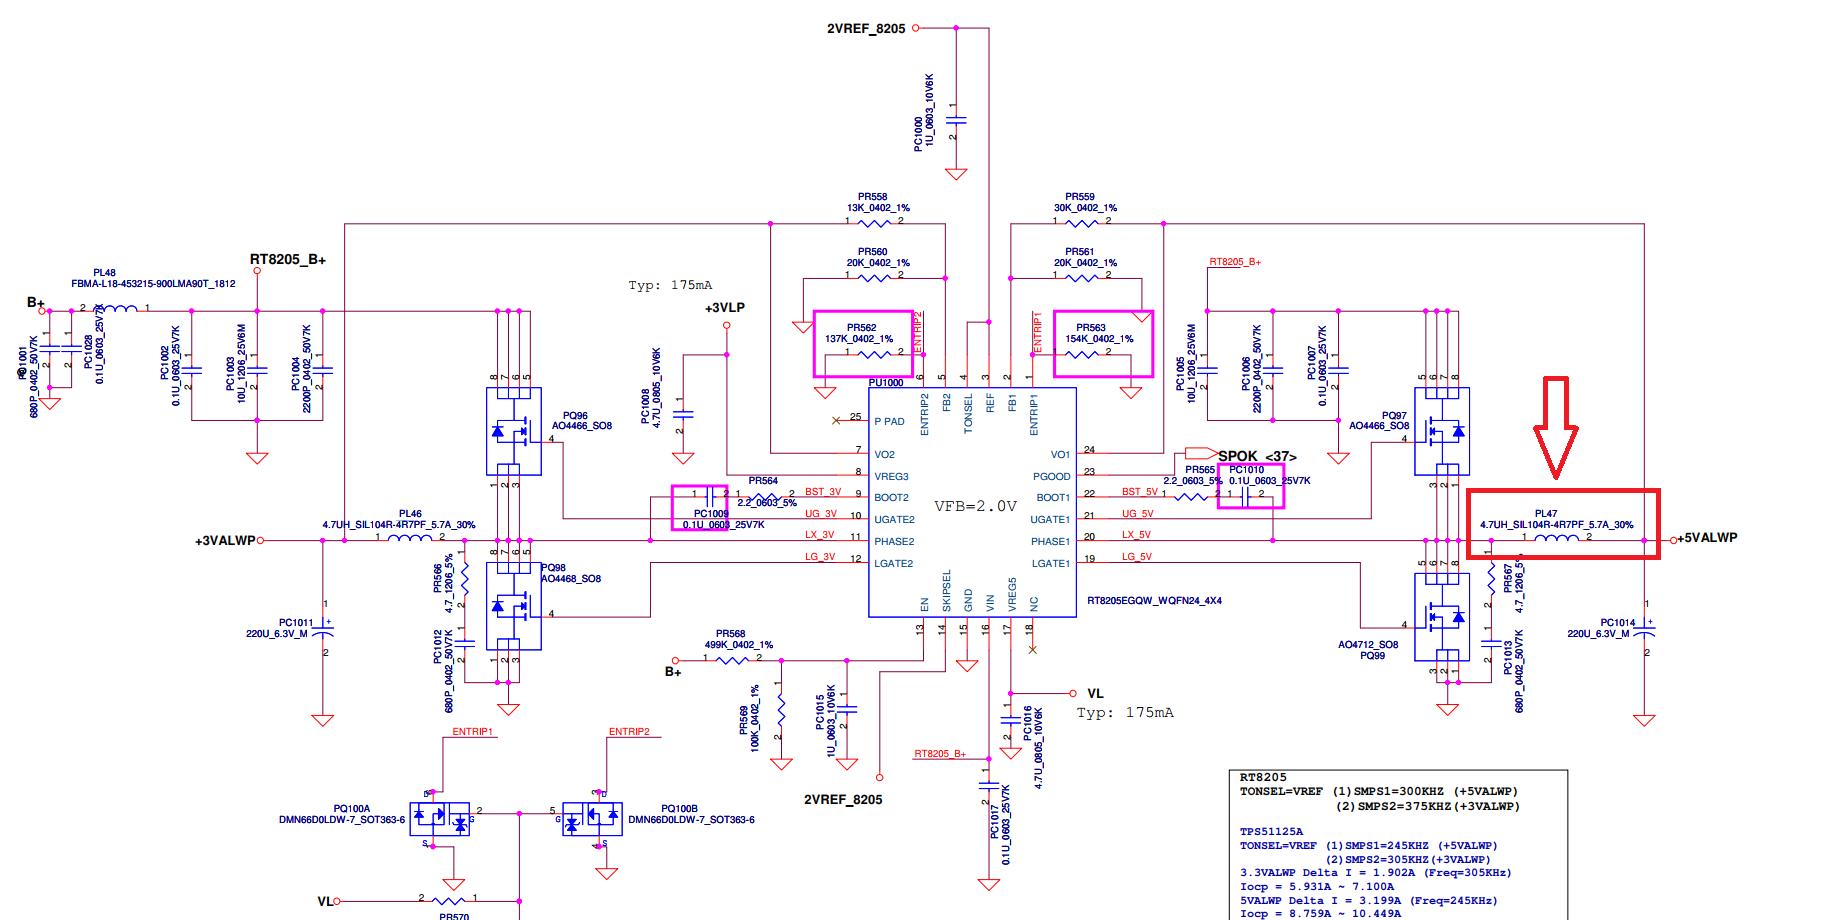 Wo kann man eine 4R7 Spule kaufen? - Mikrocontroller.net